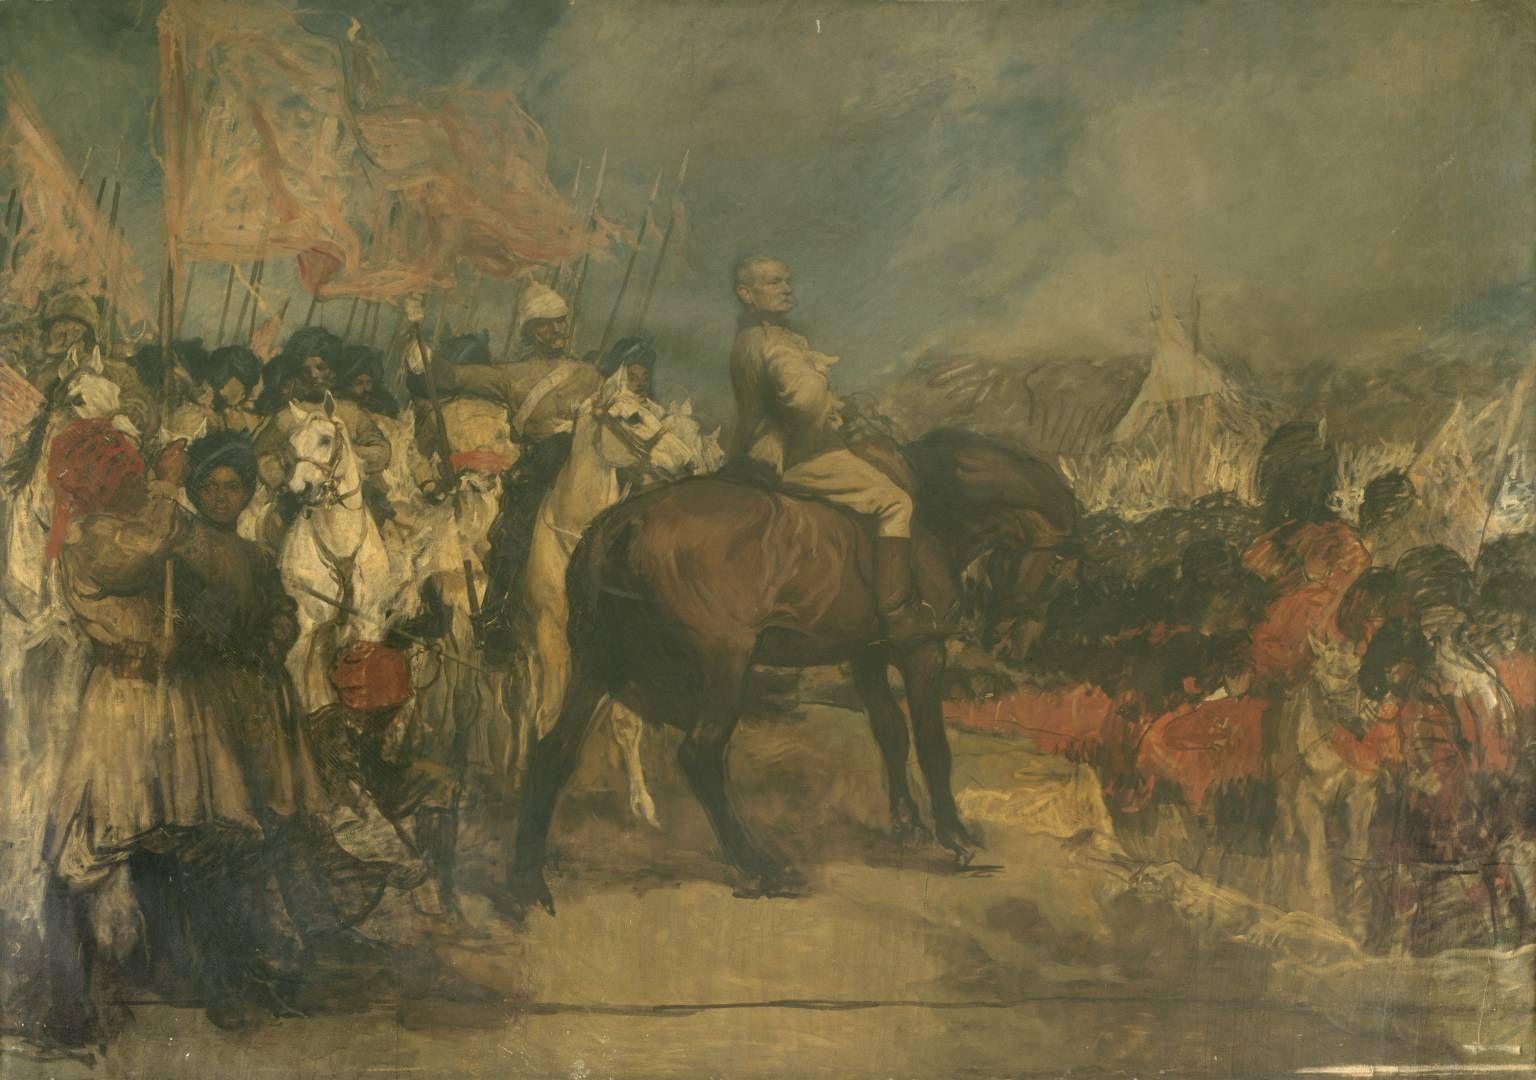 'Field-Marshal Earl Roberts, KG, VC, OM', Charles Wellington Furse | Tate